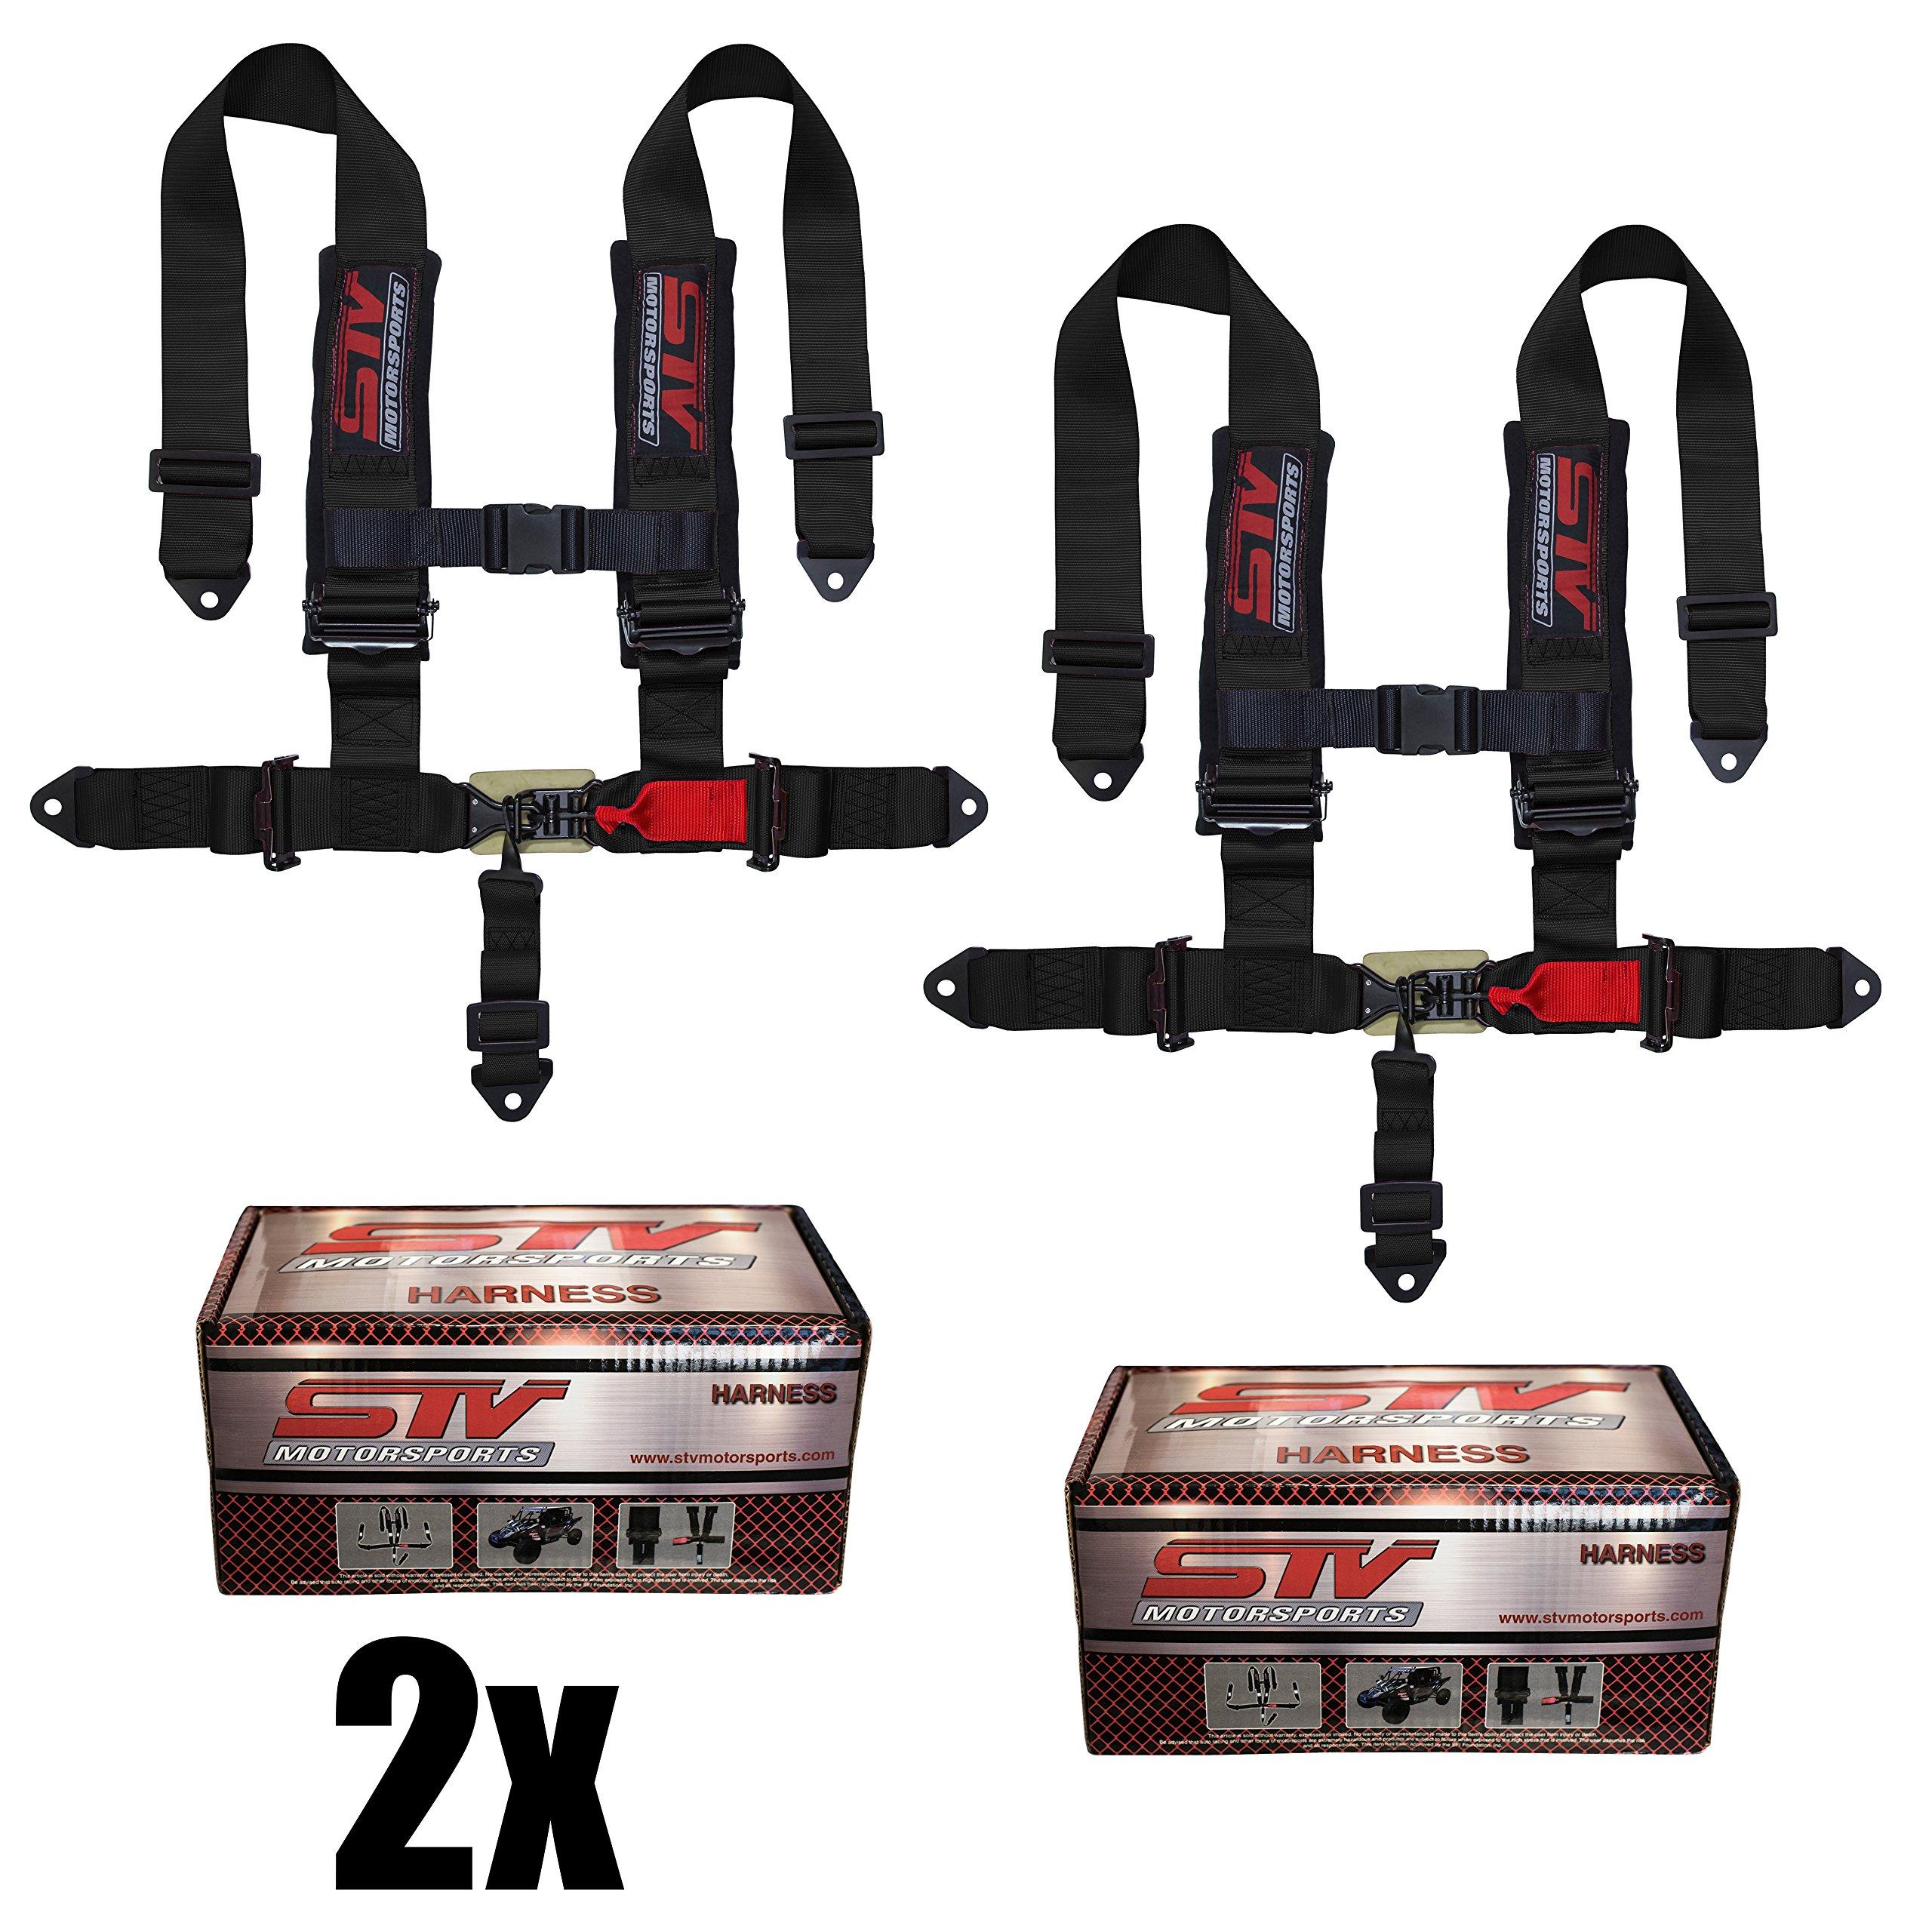 STVMotorsports 5 Point 3'' Straps Seat Harness Set Latch and Link Shoulder Pads RH5.3H - for Off-Road Vehicles, UTV, Trucks (Pair) (Black)